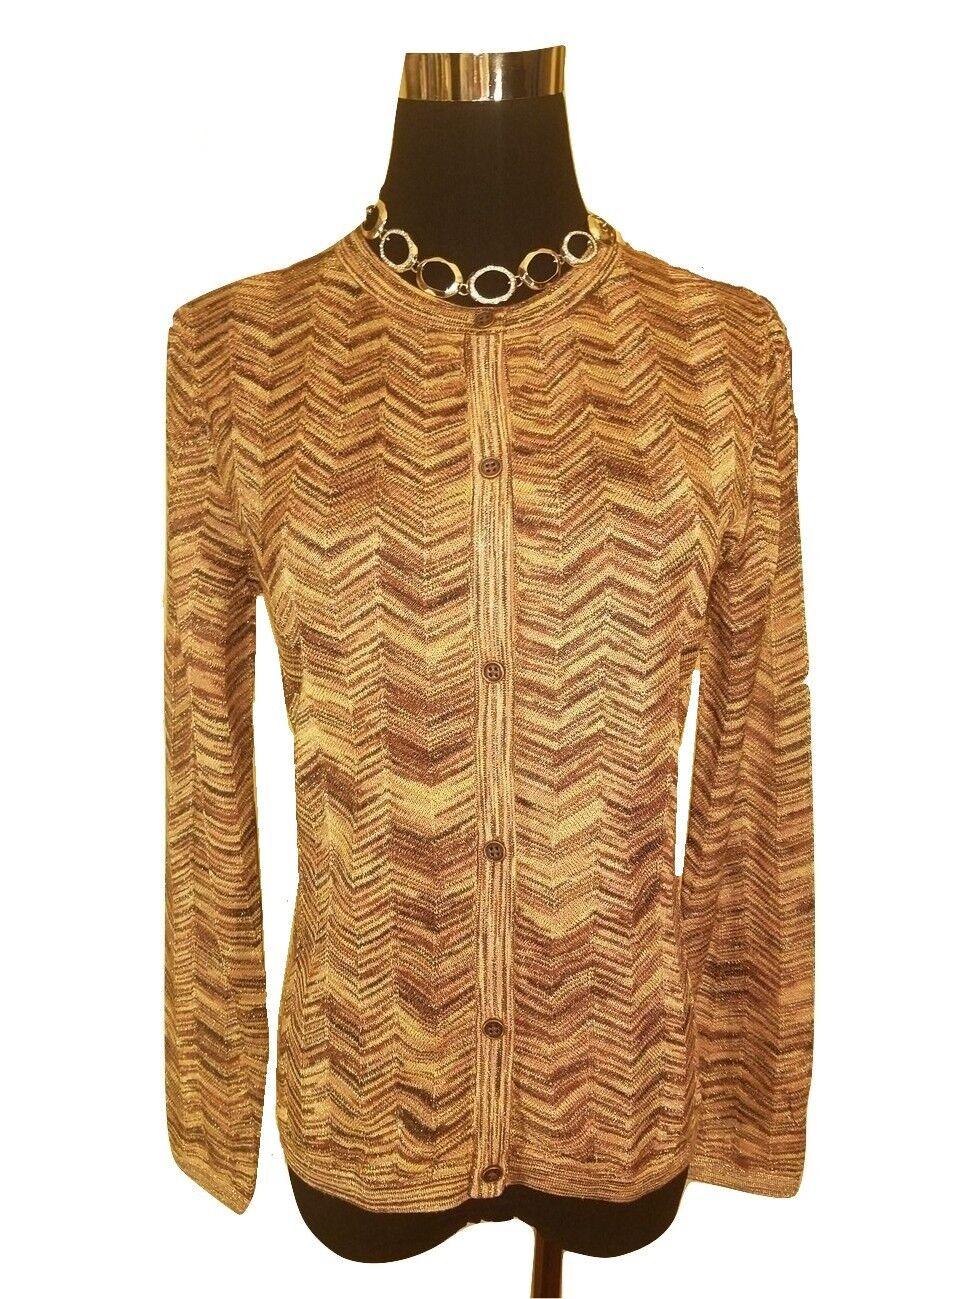 NEW  Missoni Metallic Knit Sweater Cardigan - Elegant gold Chevron